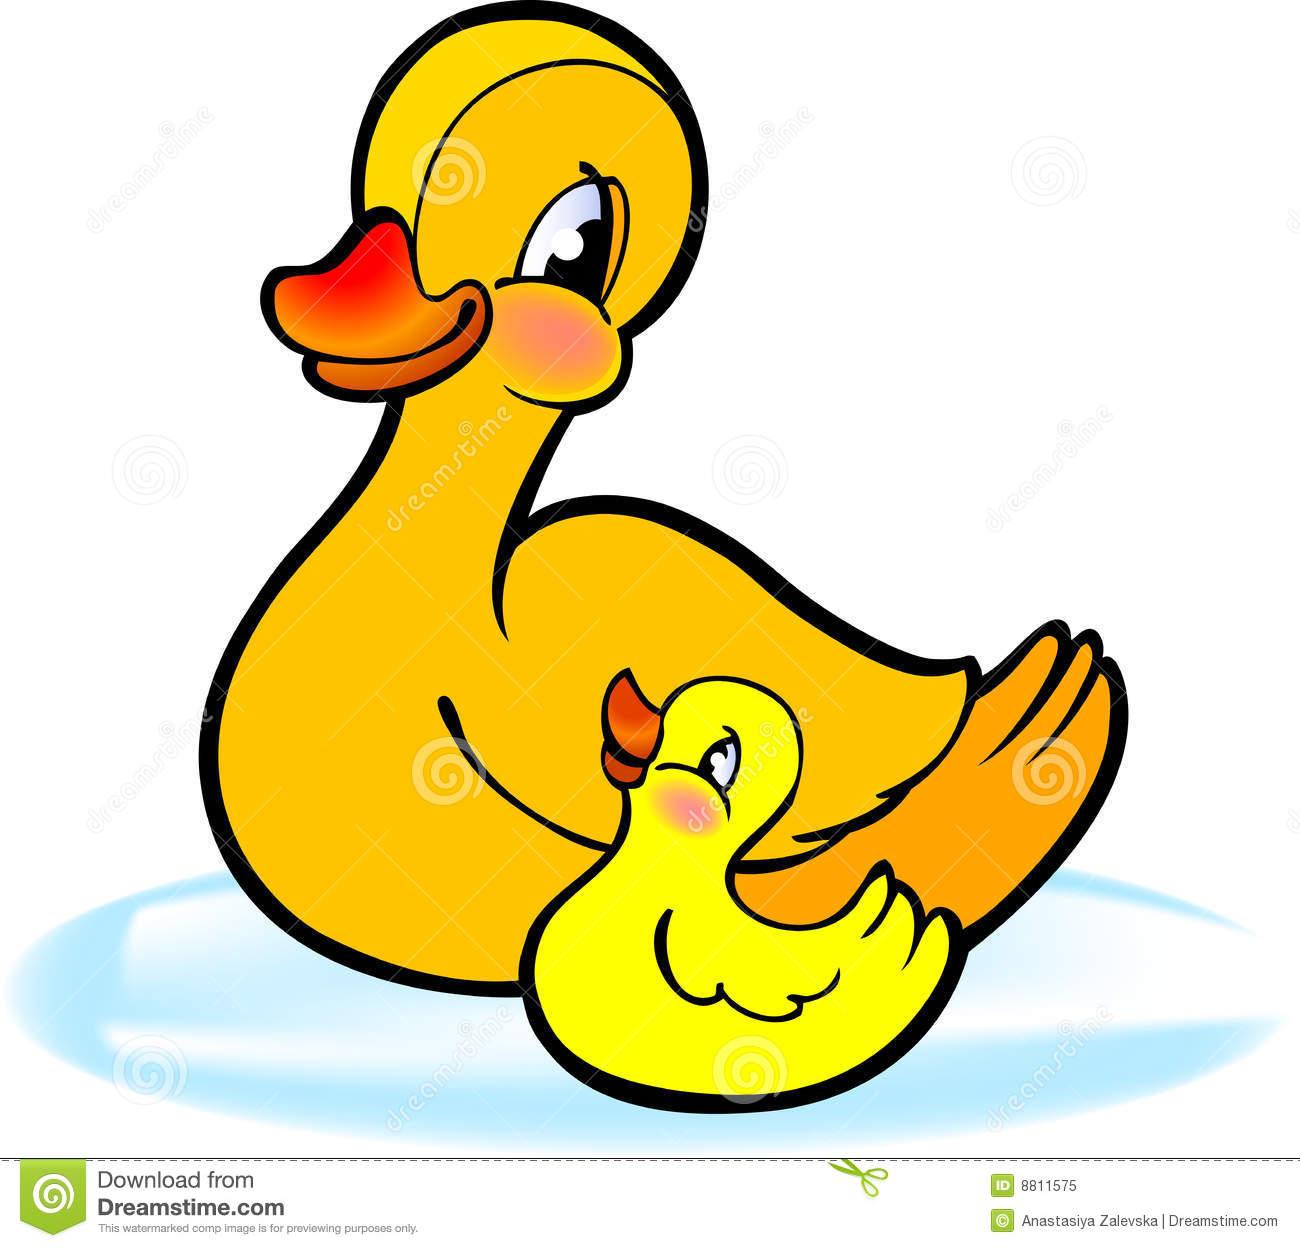 Duckling clipart Duck Clipart Ducklings Panda Clipart